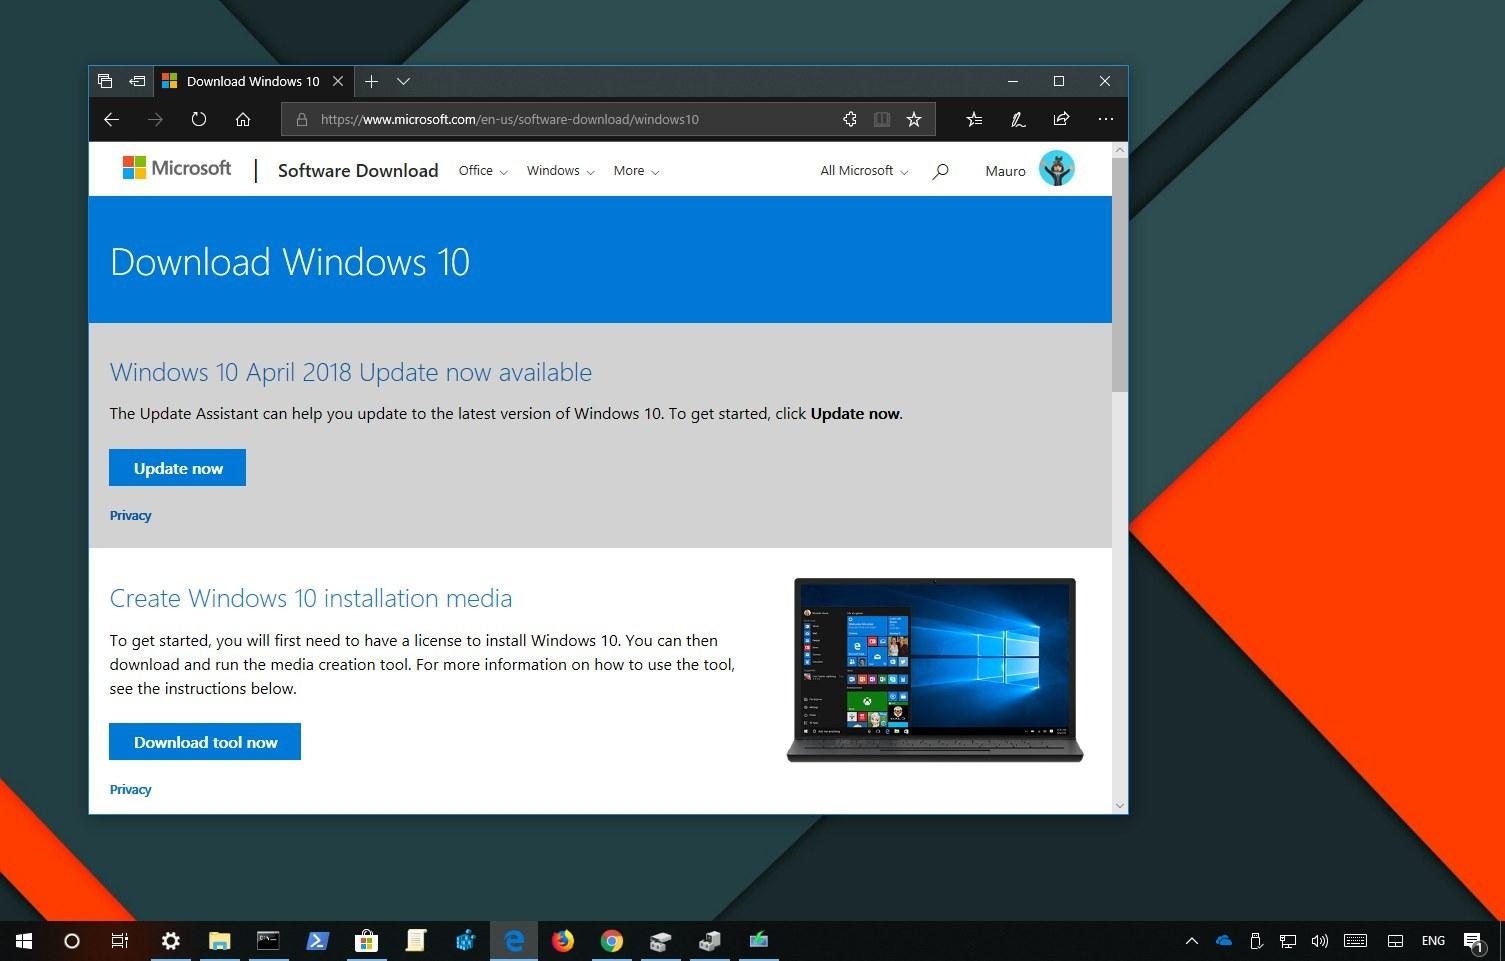 Windows 10 version 1803 (April 2018 Update) ISO download